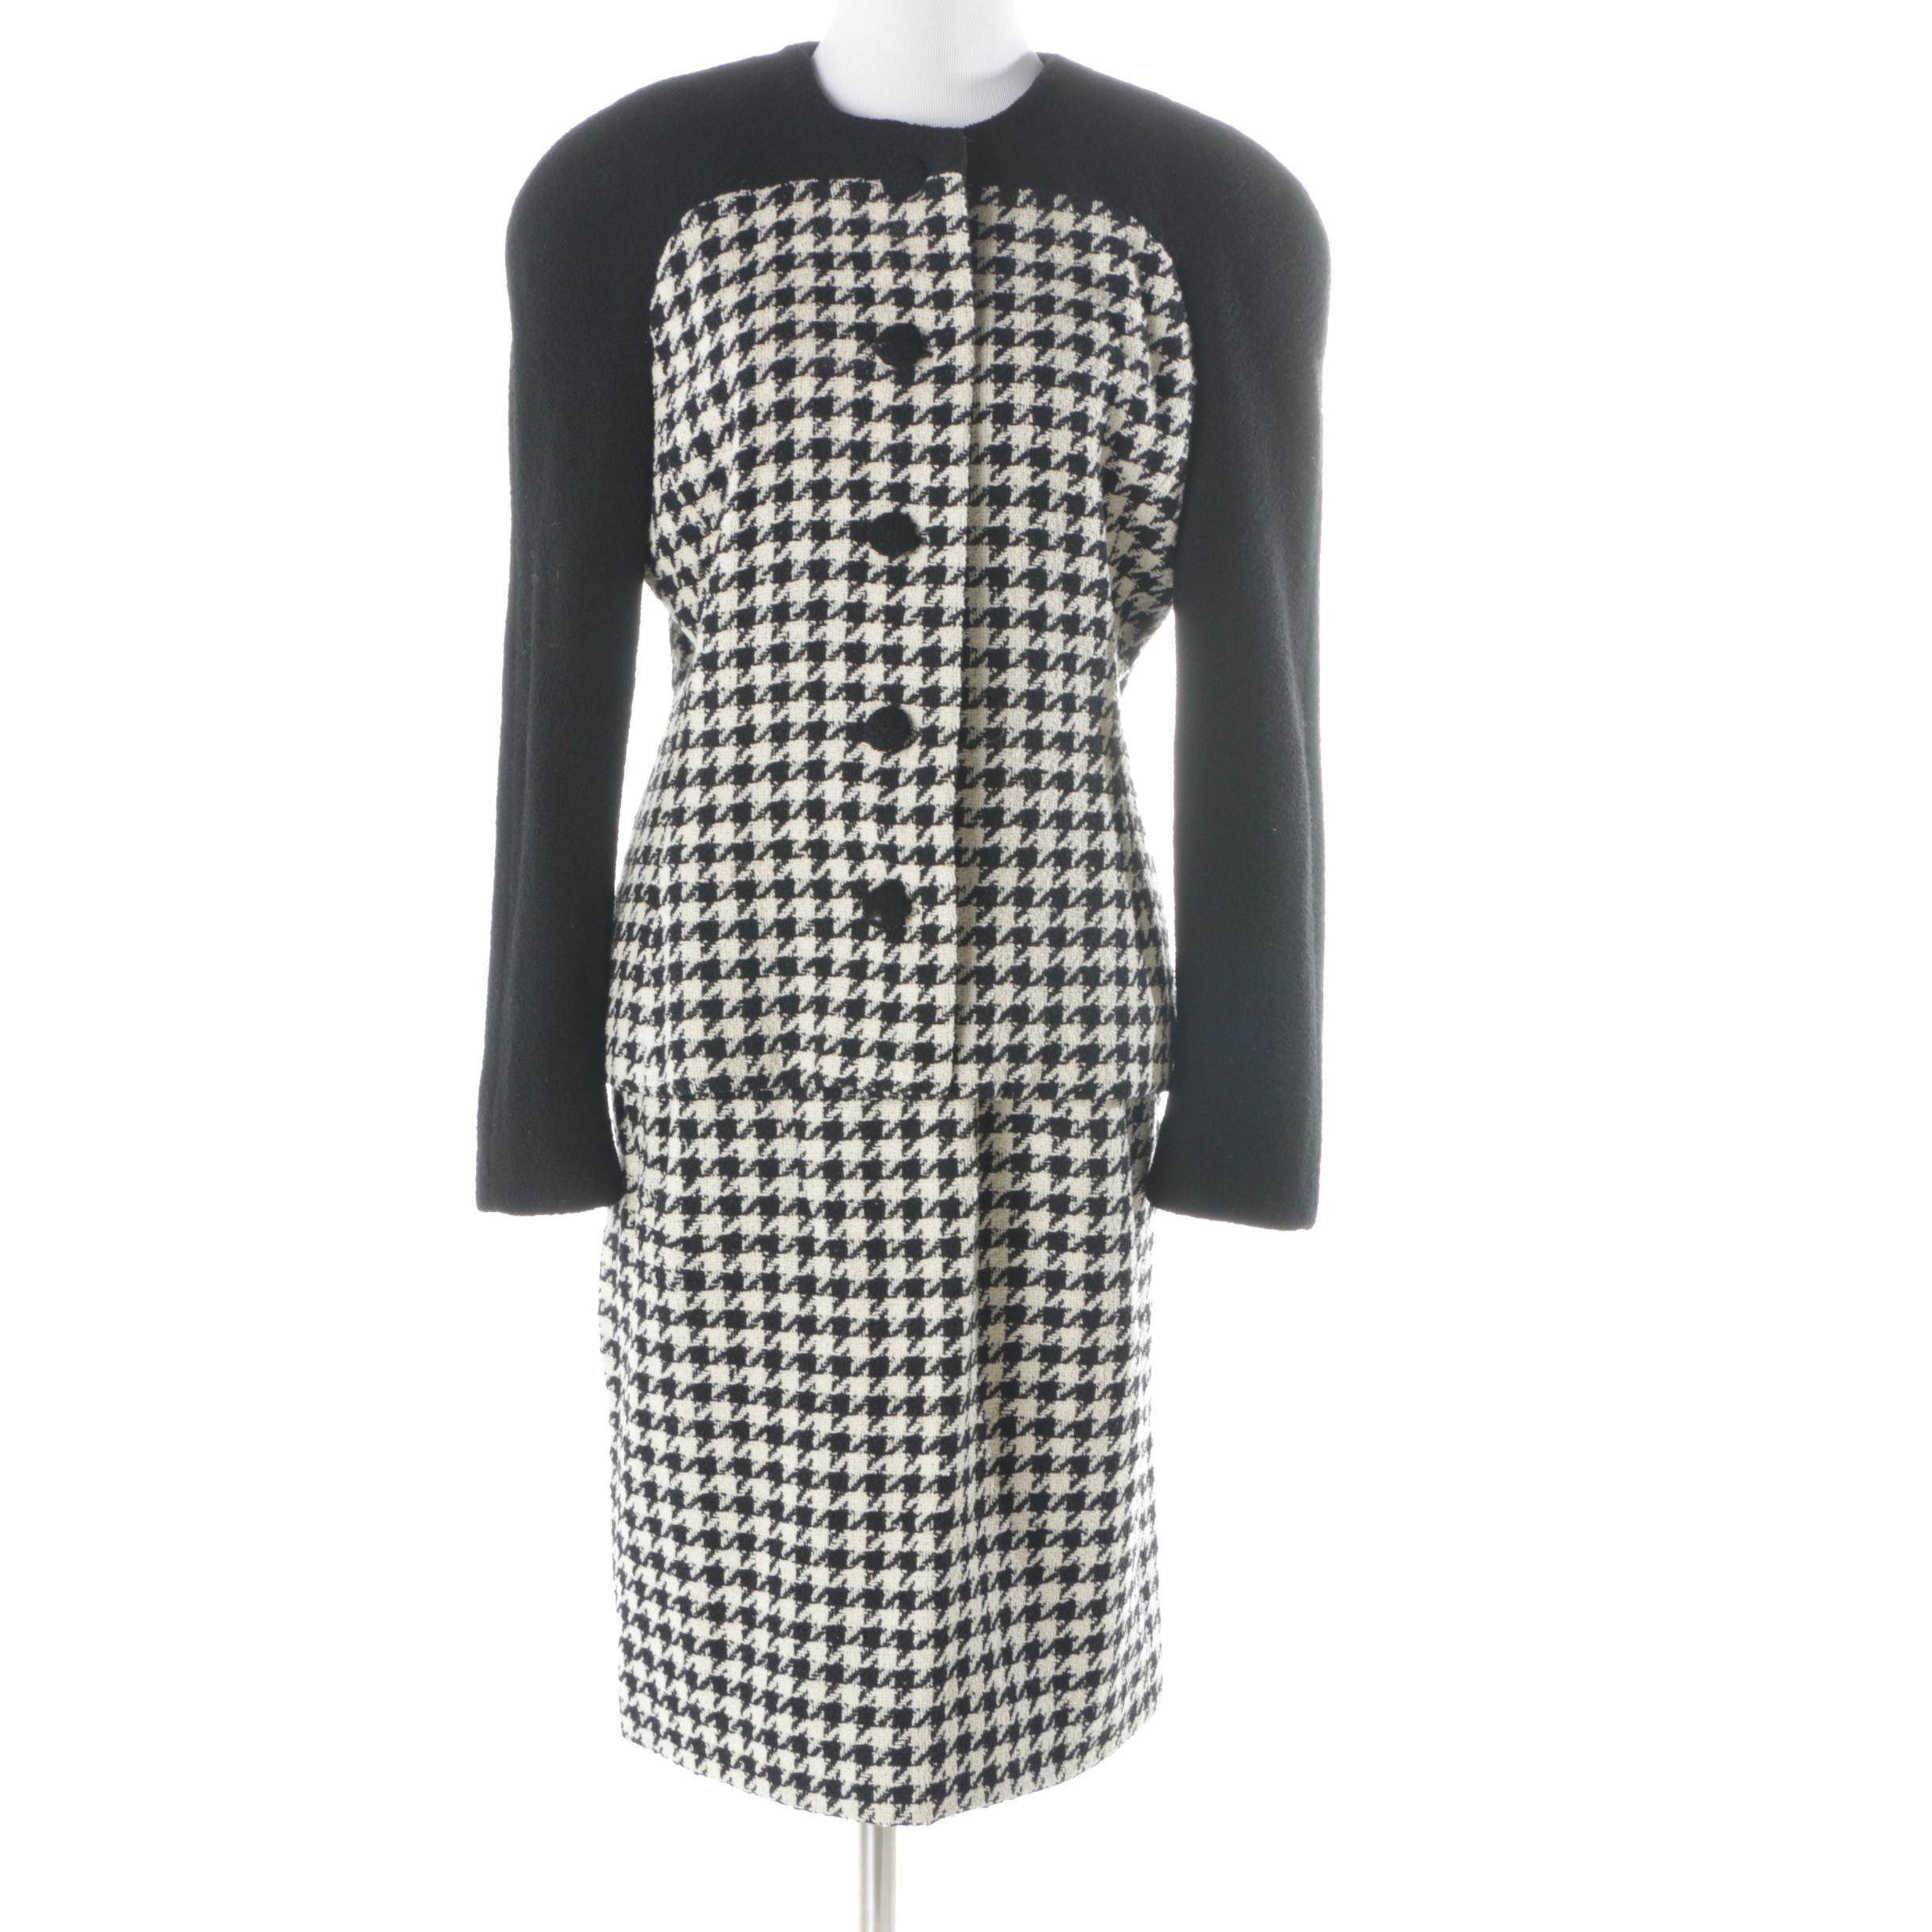 Women's CH by Carolina Herrera Houndstooth Check Wool Suit